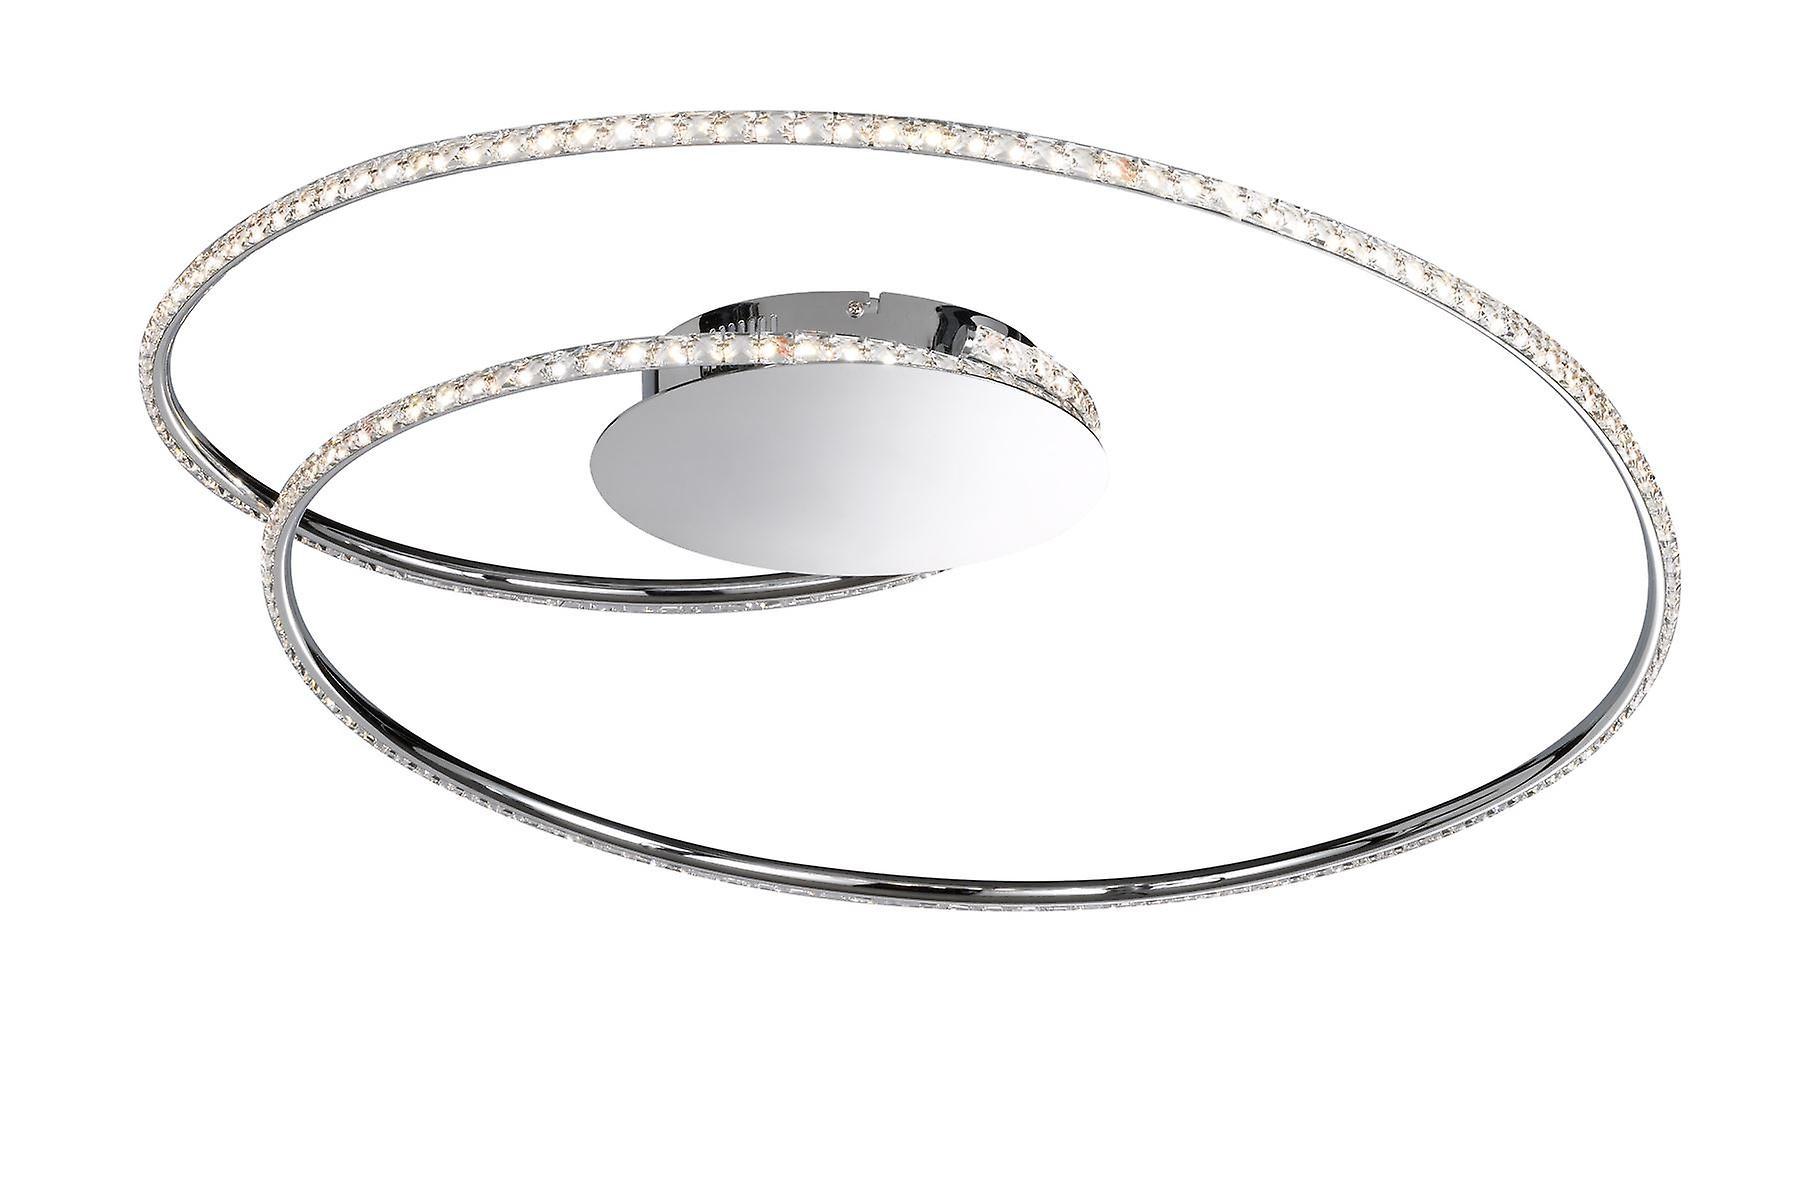 Wofi Opus - Dimmable LED 1 Light Flush Plafond Lumière Chrome - 9422.01.01.6700